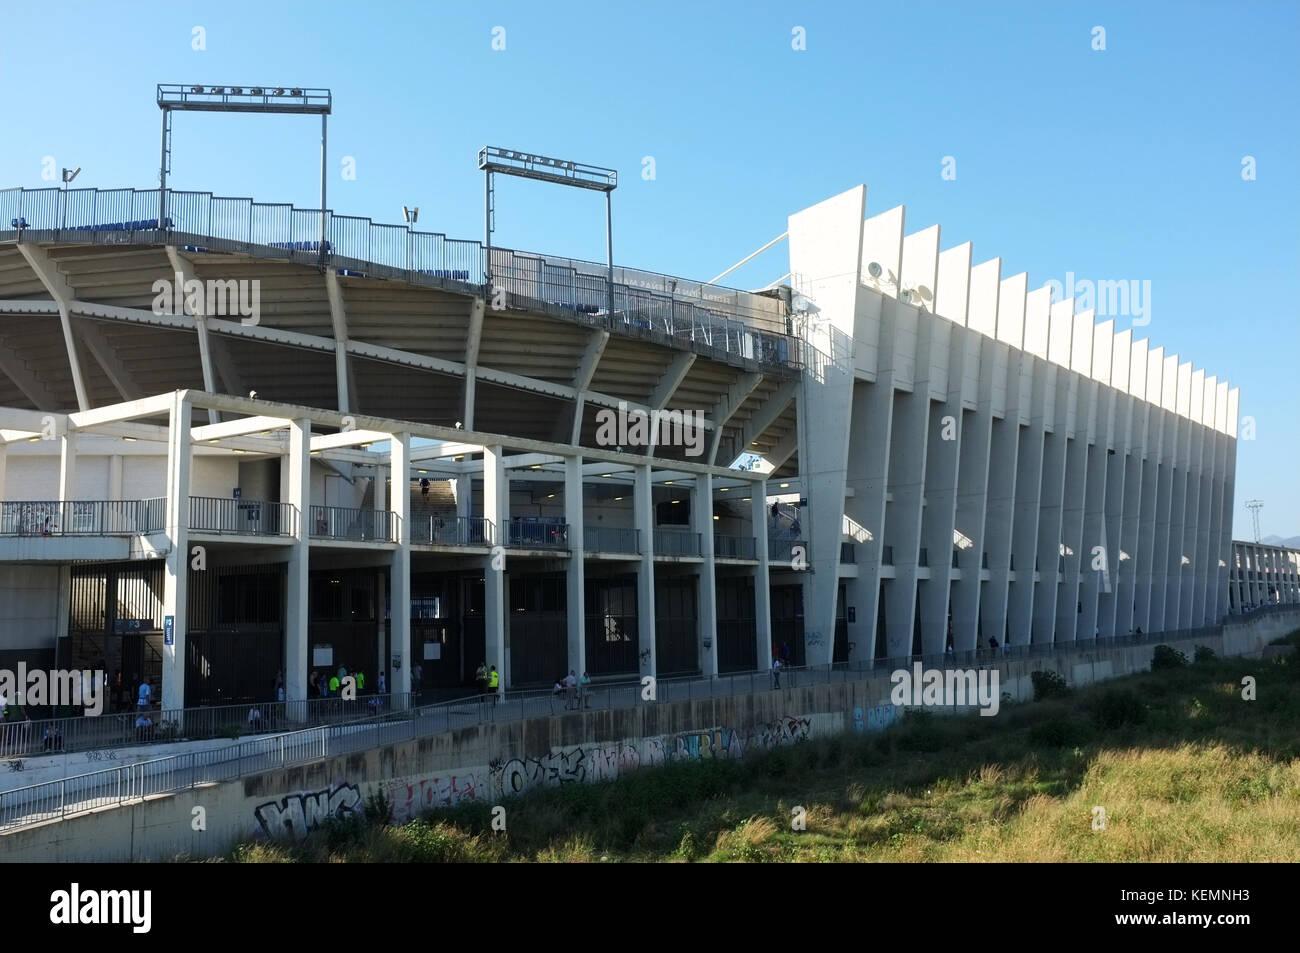 Outside the La Rosaleda Stadium, Malaga, Andalucia, Spain, September 2017 - Stock Image